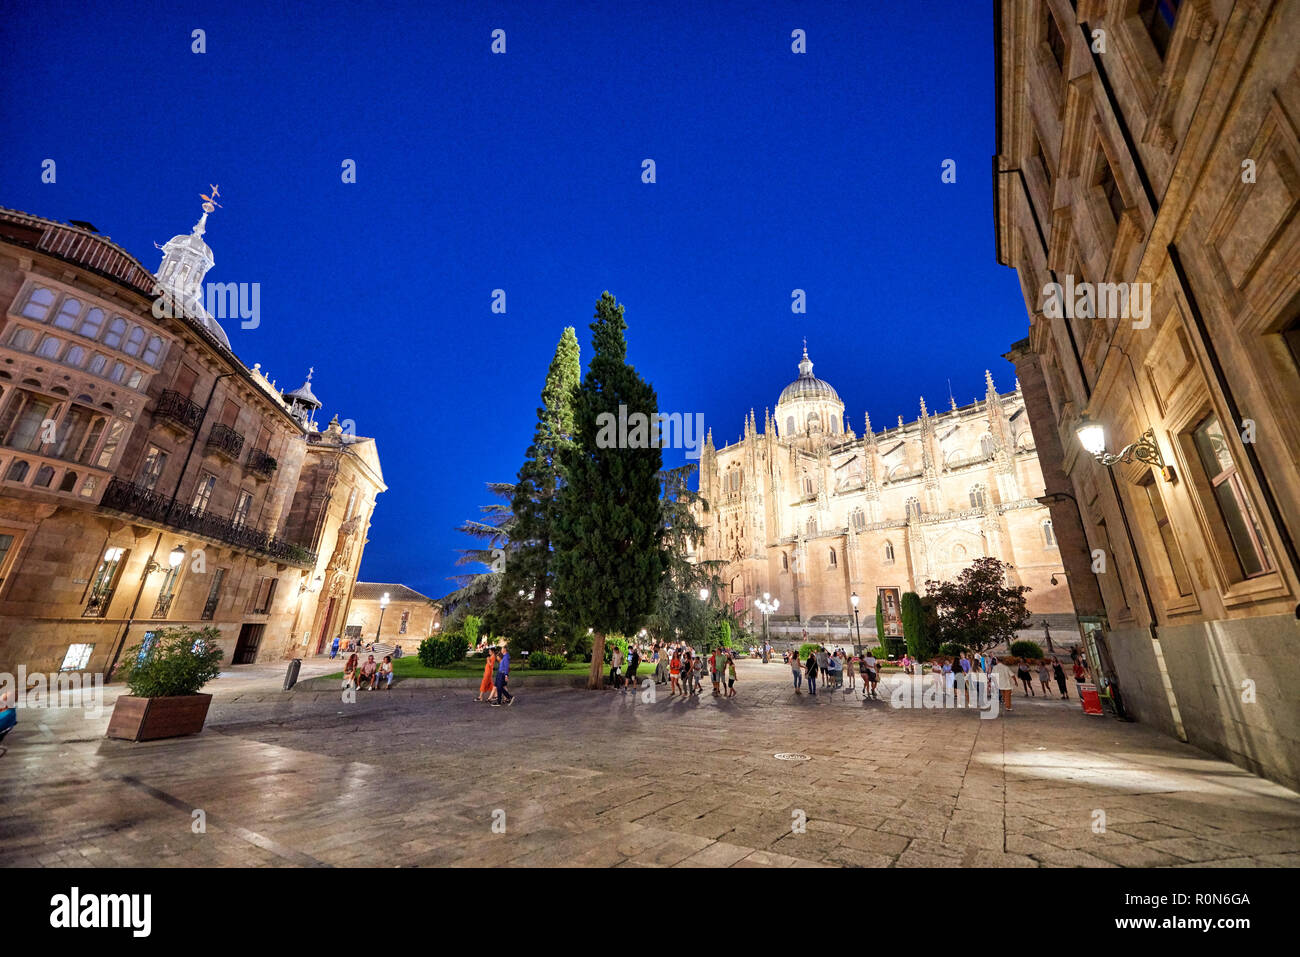 New Cathedral of Salamanca, Salamanca City, Spain, Europe - Stock Image